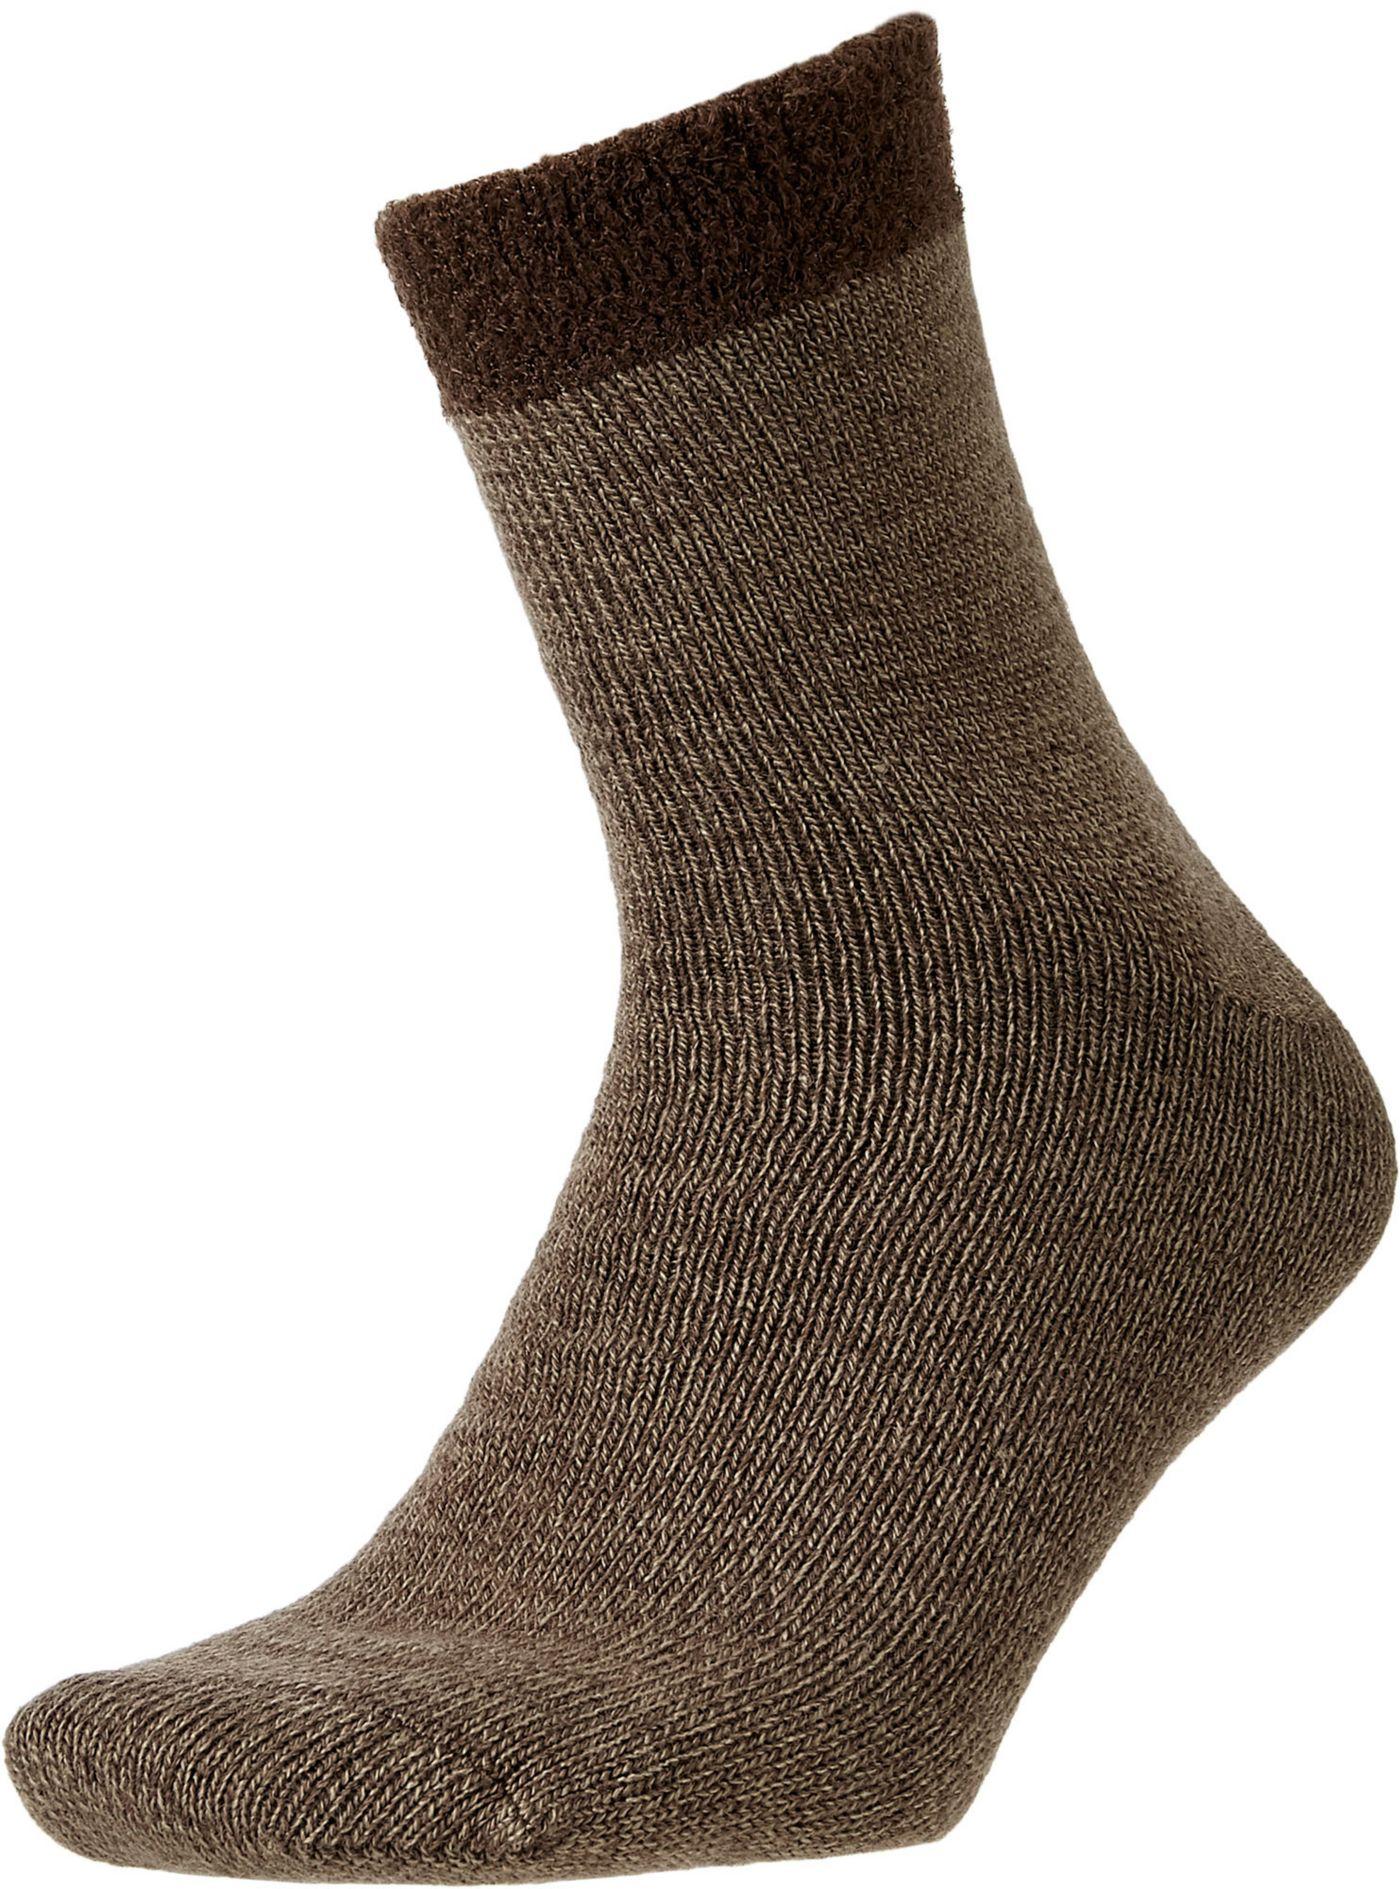 Field and Stream Men's Marled Cozy Cabin Socks